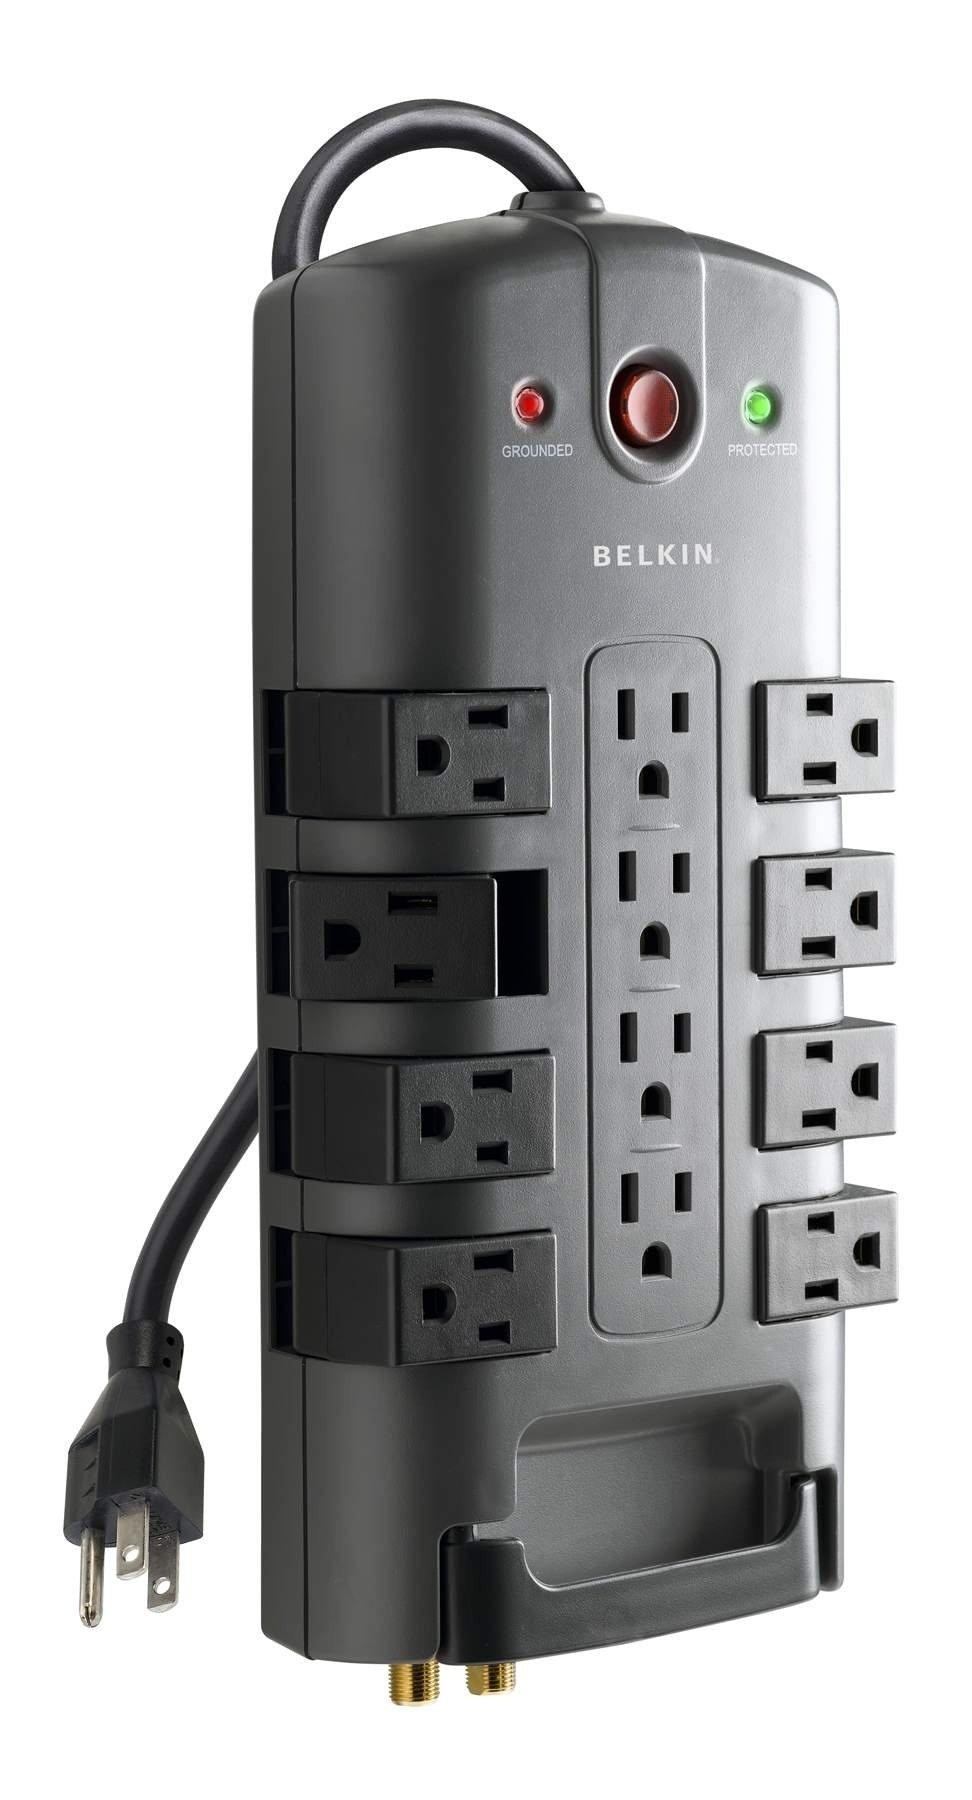 Belkin 12 Outlet Pivot Plug Power Protector